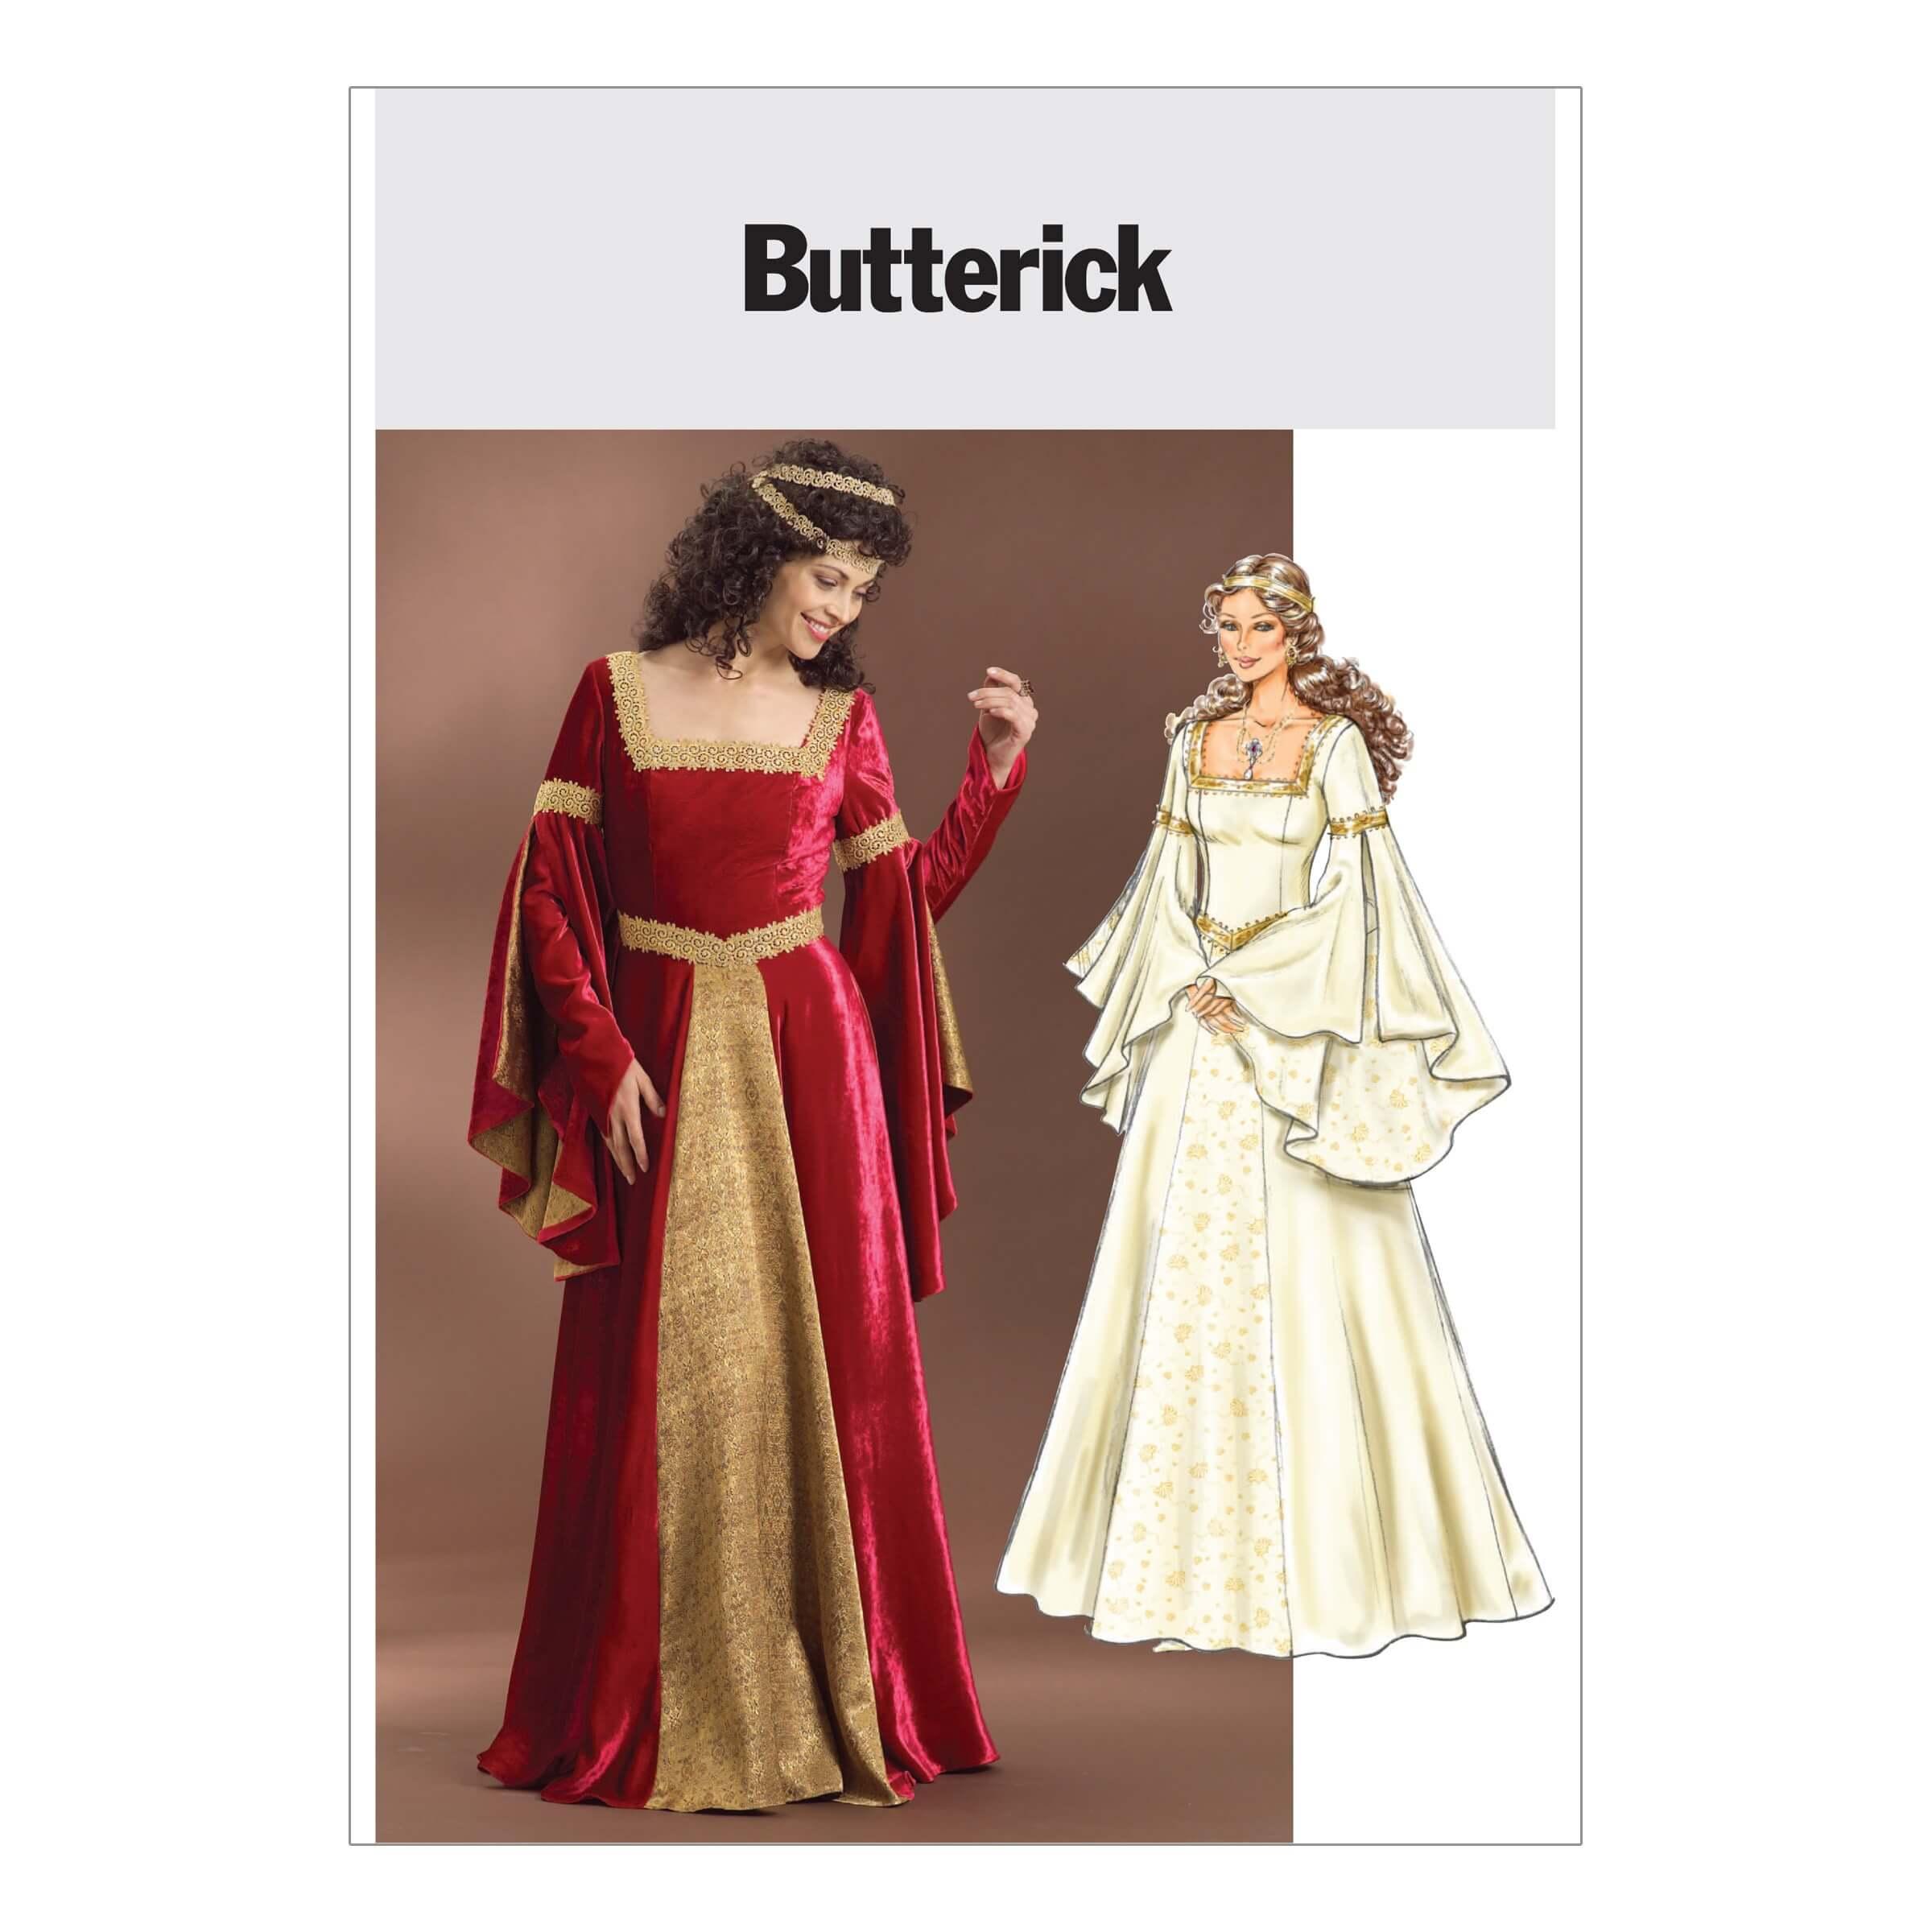 Butterick Sewing Pattern 4571Women's Historical Renaissance Costume